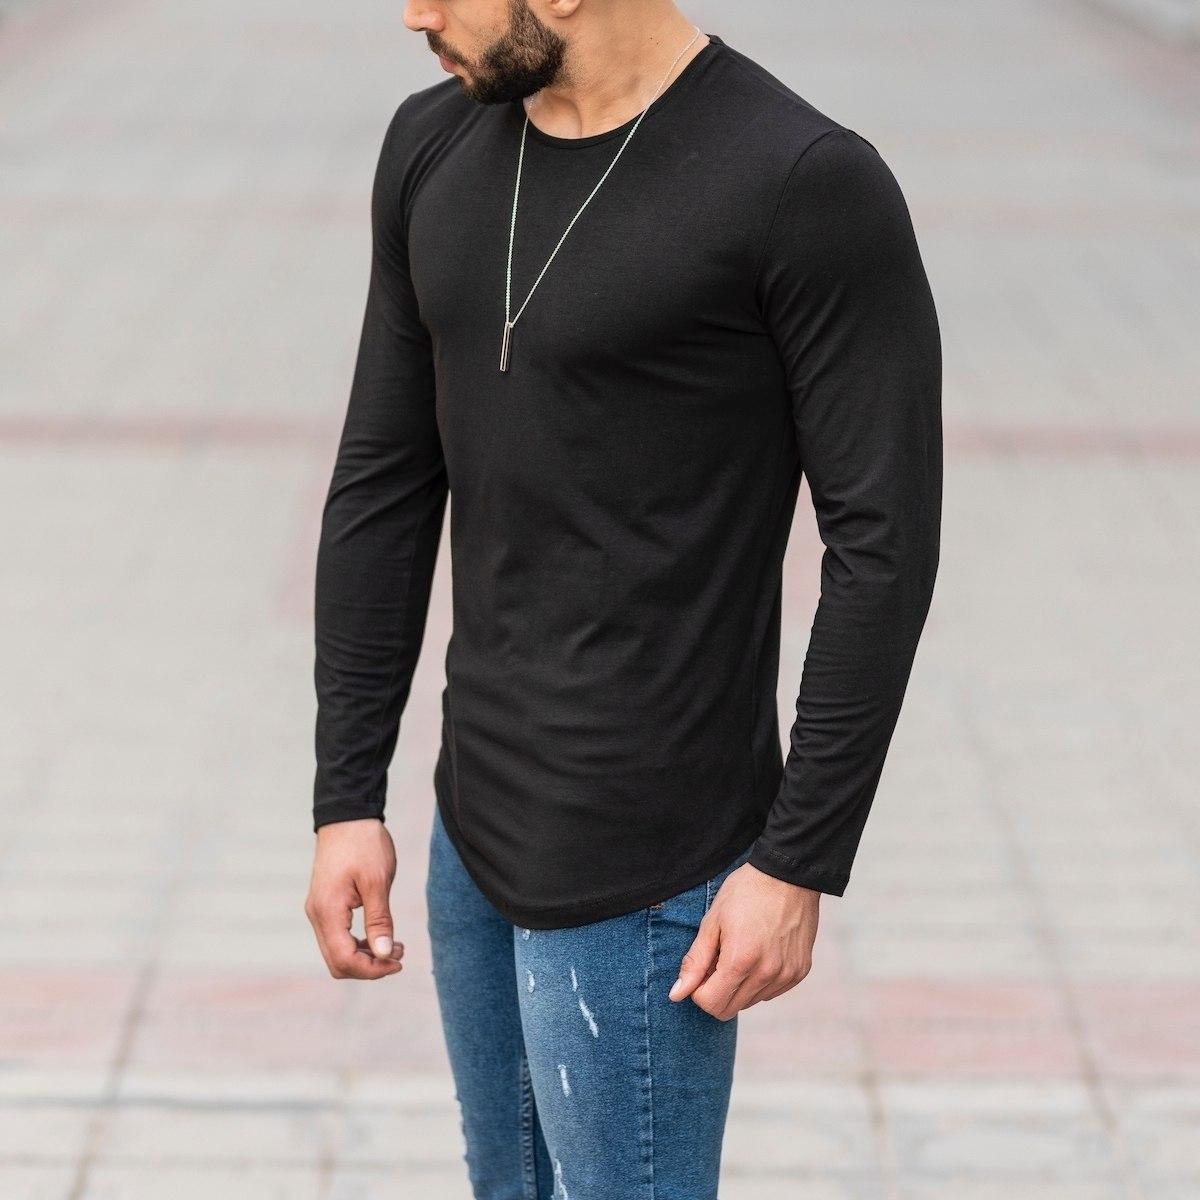 Basic Sweatshirt In Black Mv Premium Brand - 3